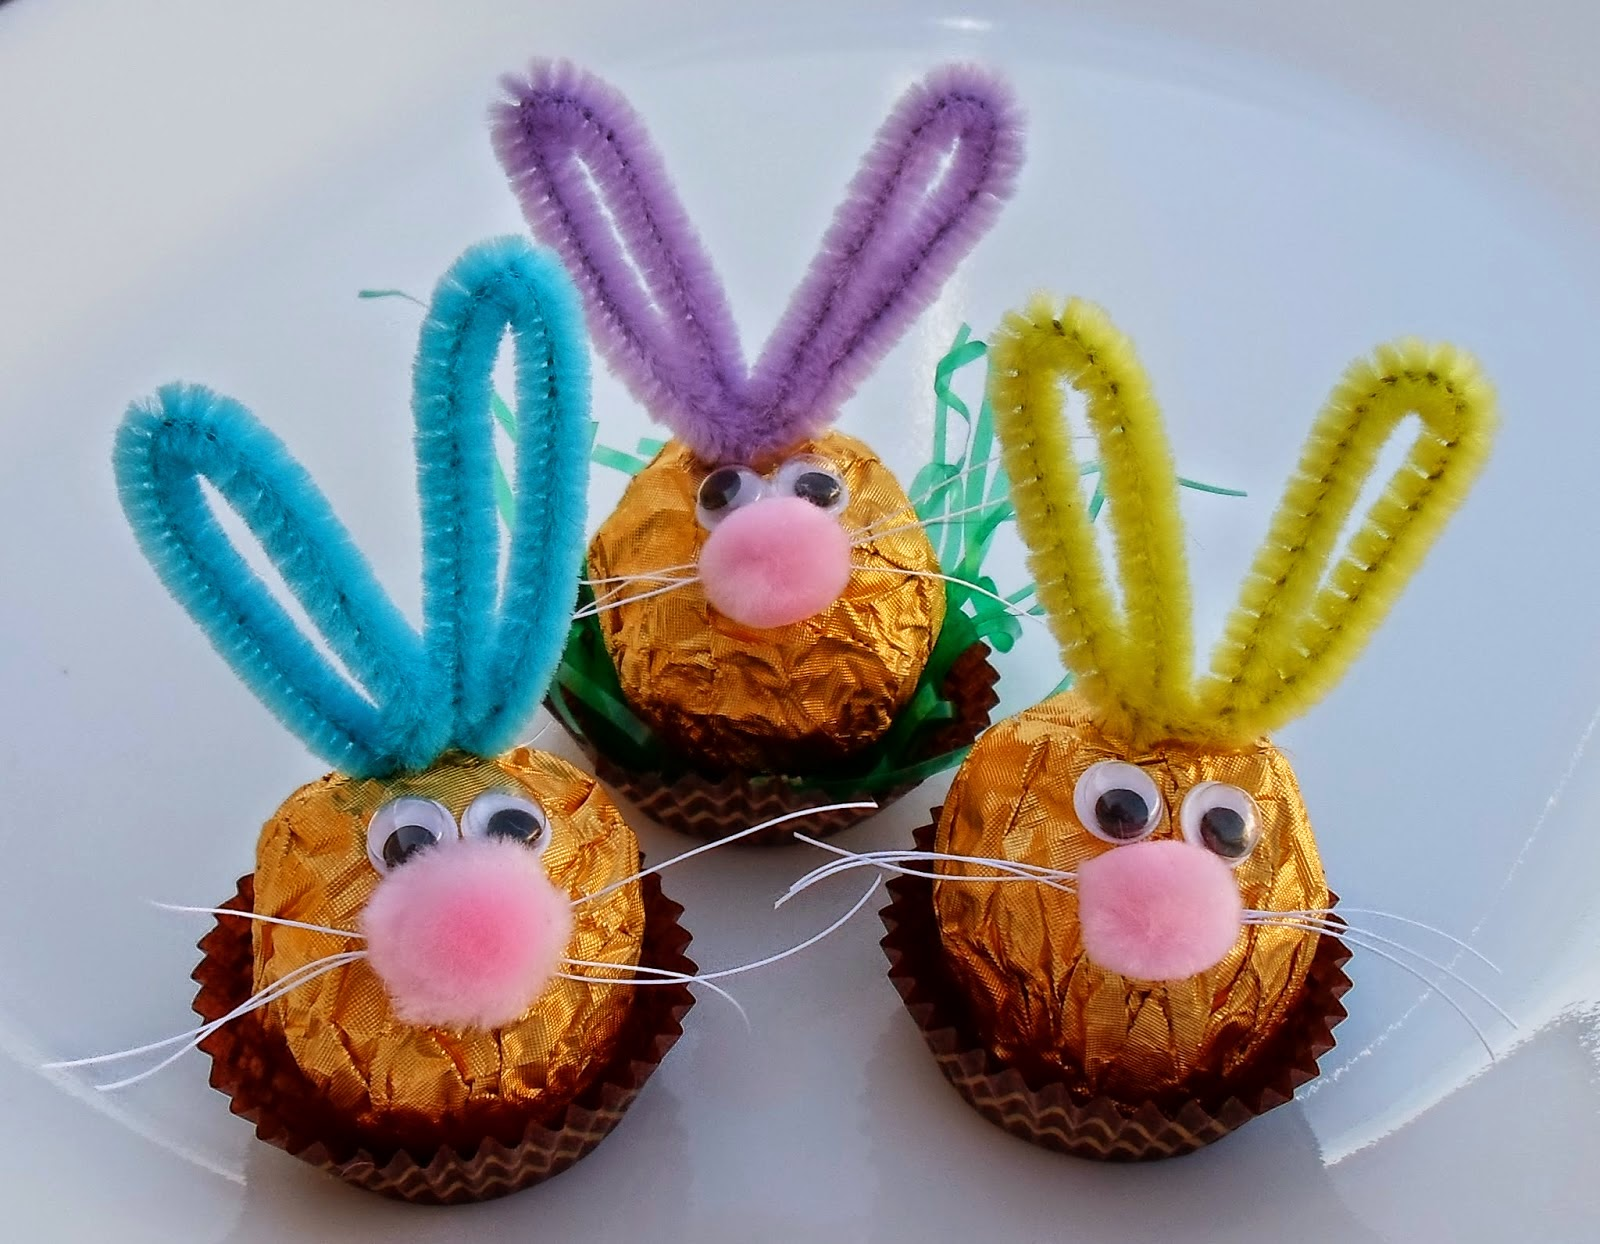 http://happierthanapiginmud.blogspot.com/2014/04/ferrero-rocher-easter-bunnies.html